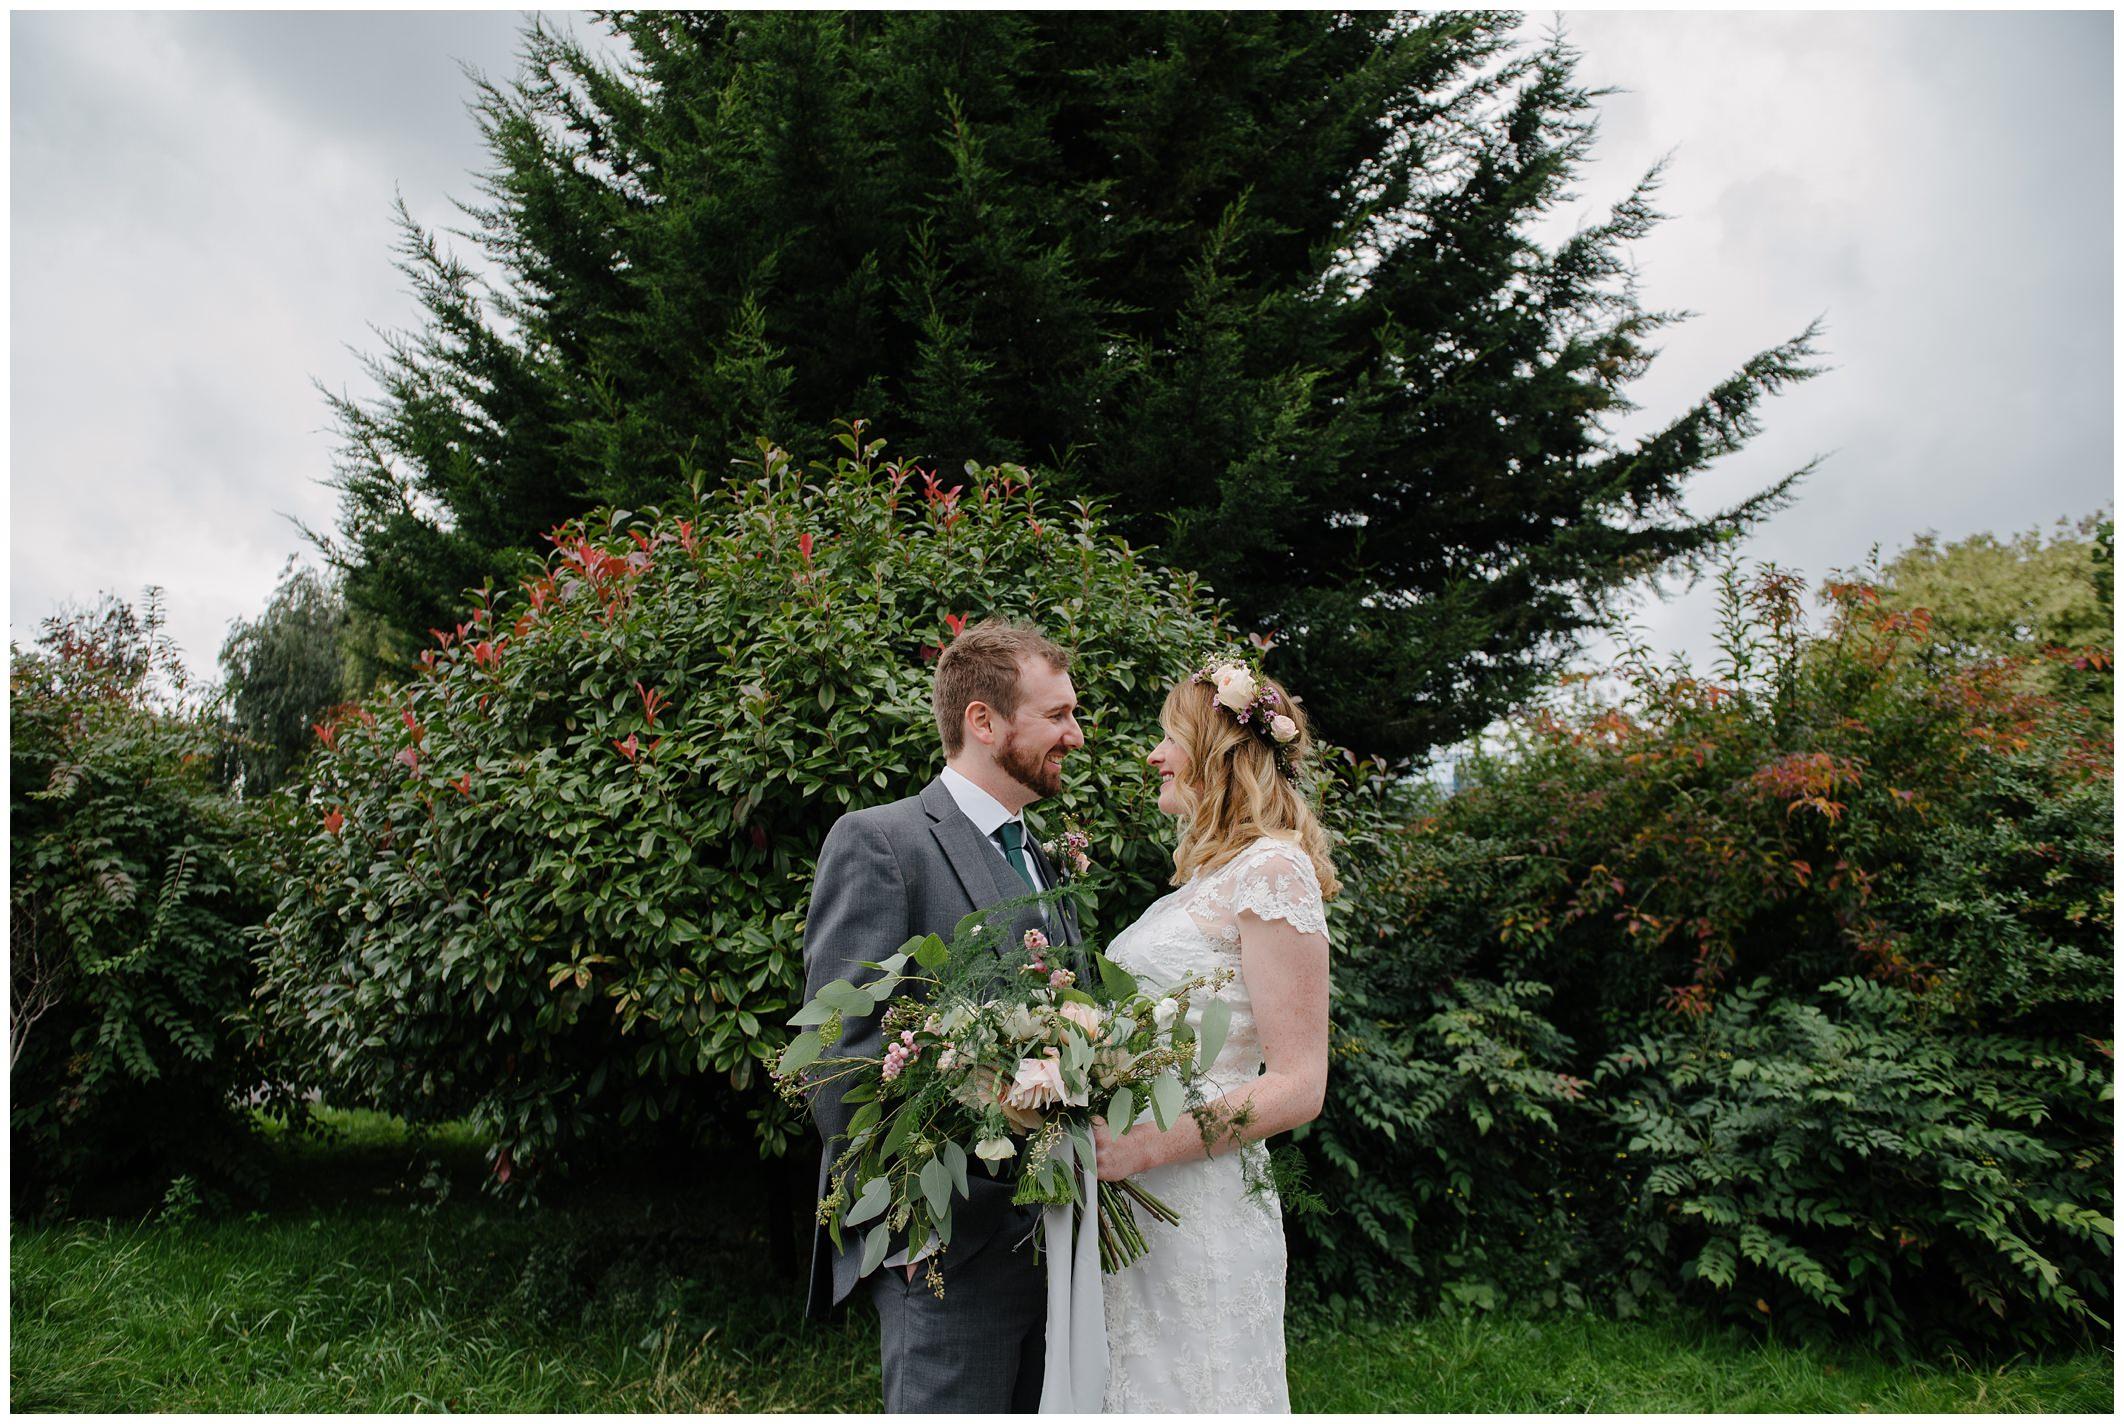 asylum_chapel_peckham_rosendale_wedding_jude_browne_photography_0101.jpg